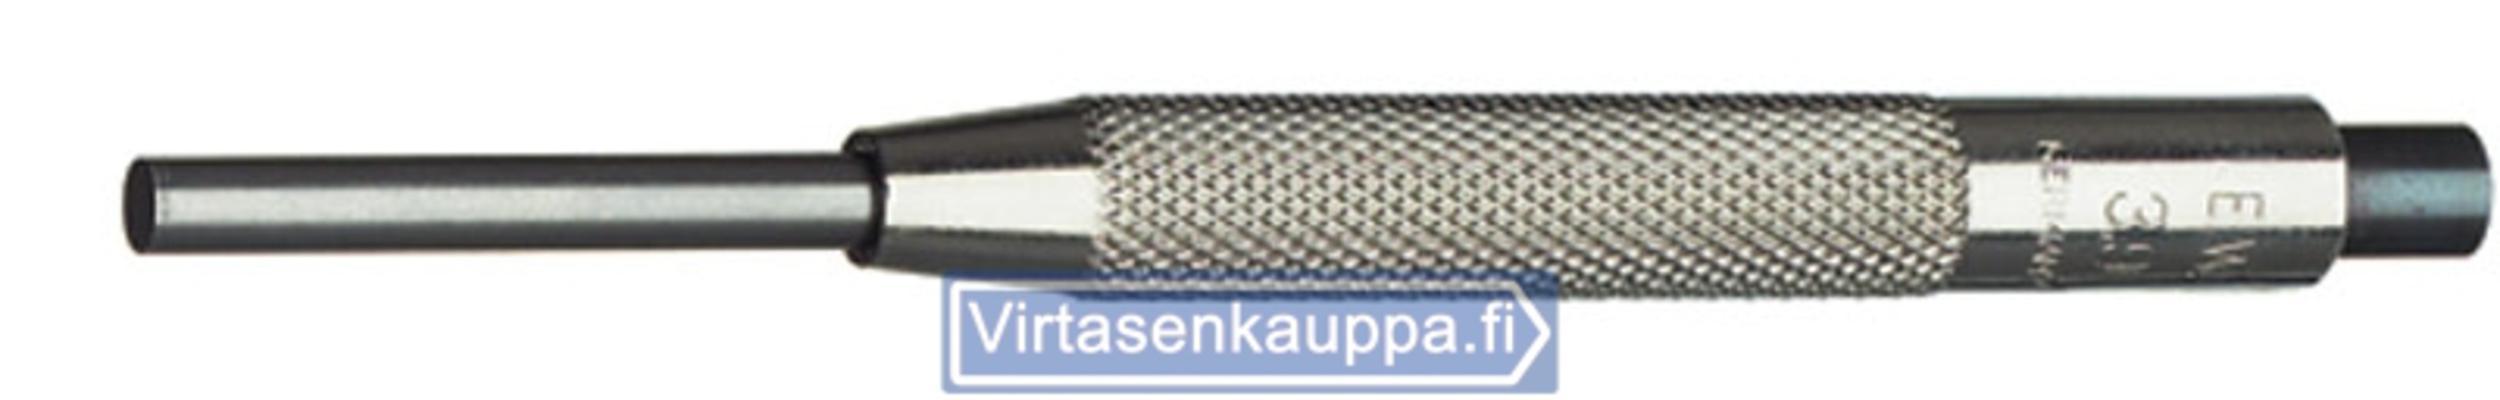 Sokkatuurna 0,9 mm, Stahlwille - Sokkatuurna 0,9 mm